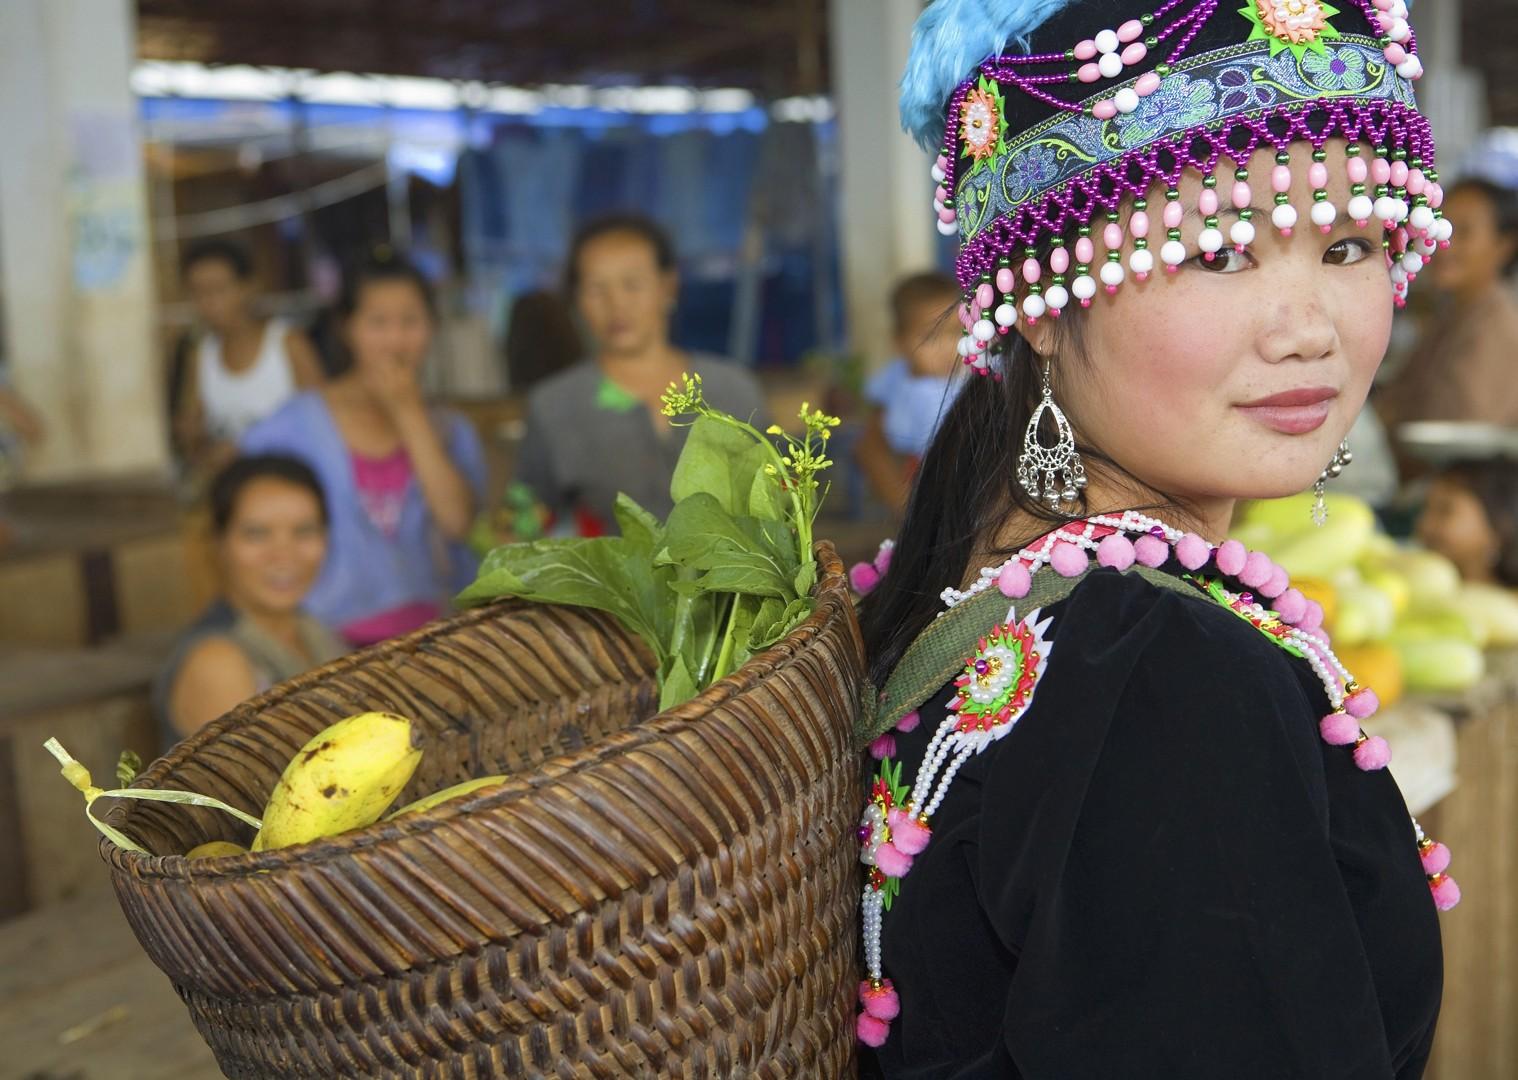 cycling-adventure-holiday-local-culture-people.jpg - Laos - Hidden Treasures - Cycling Adventures